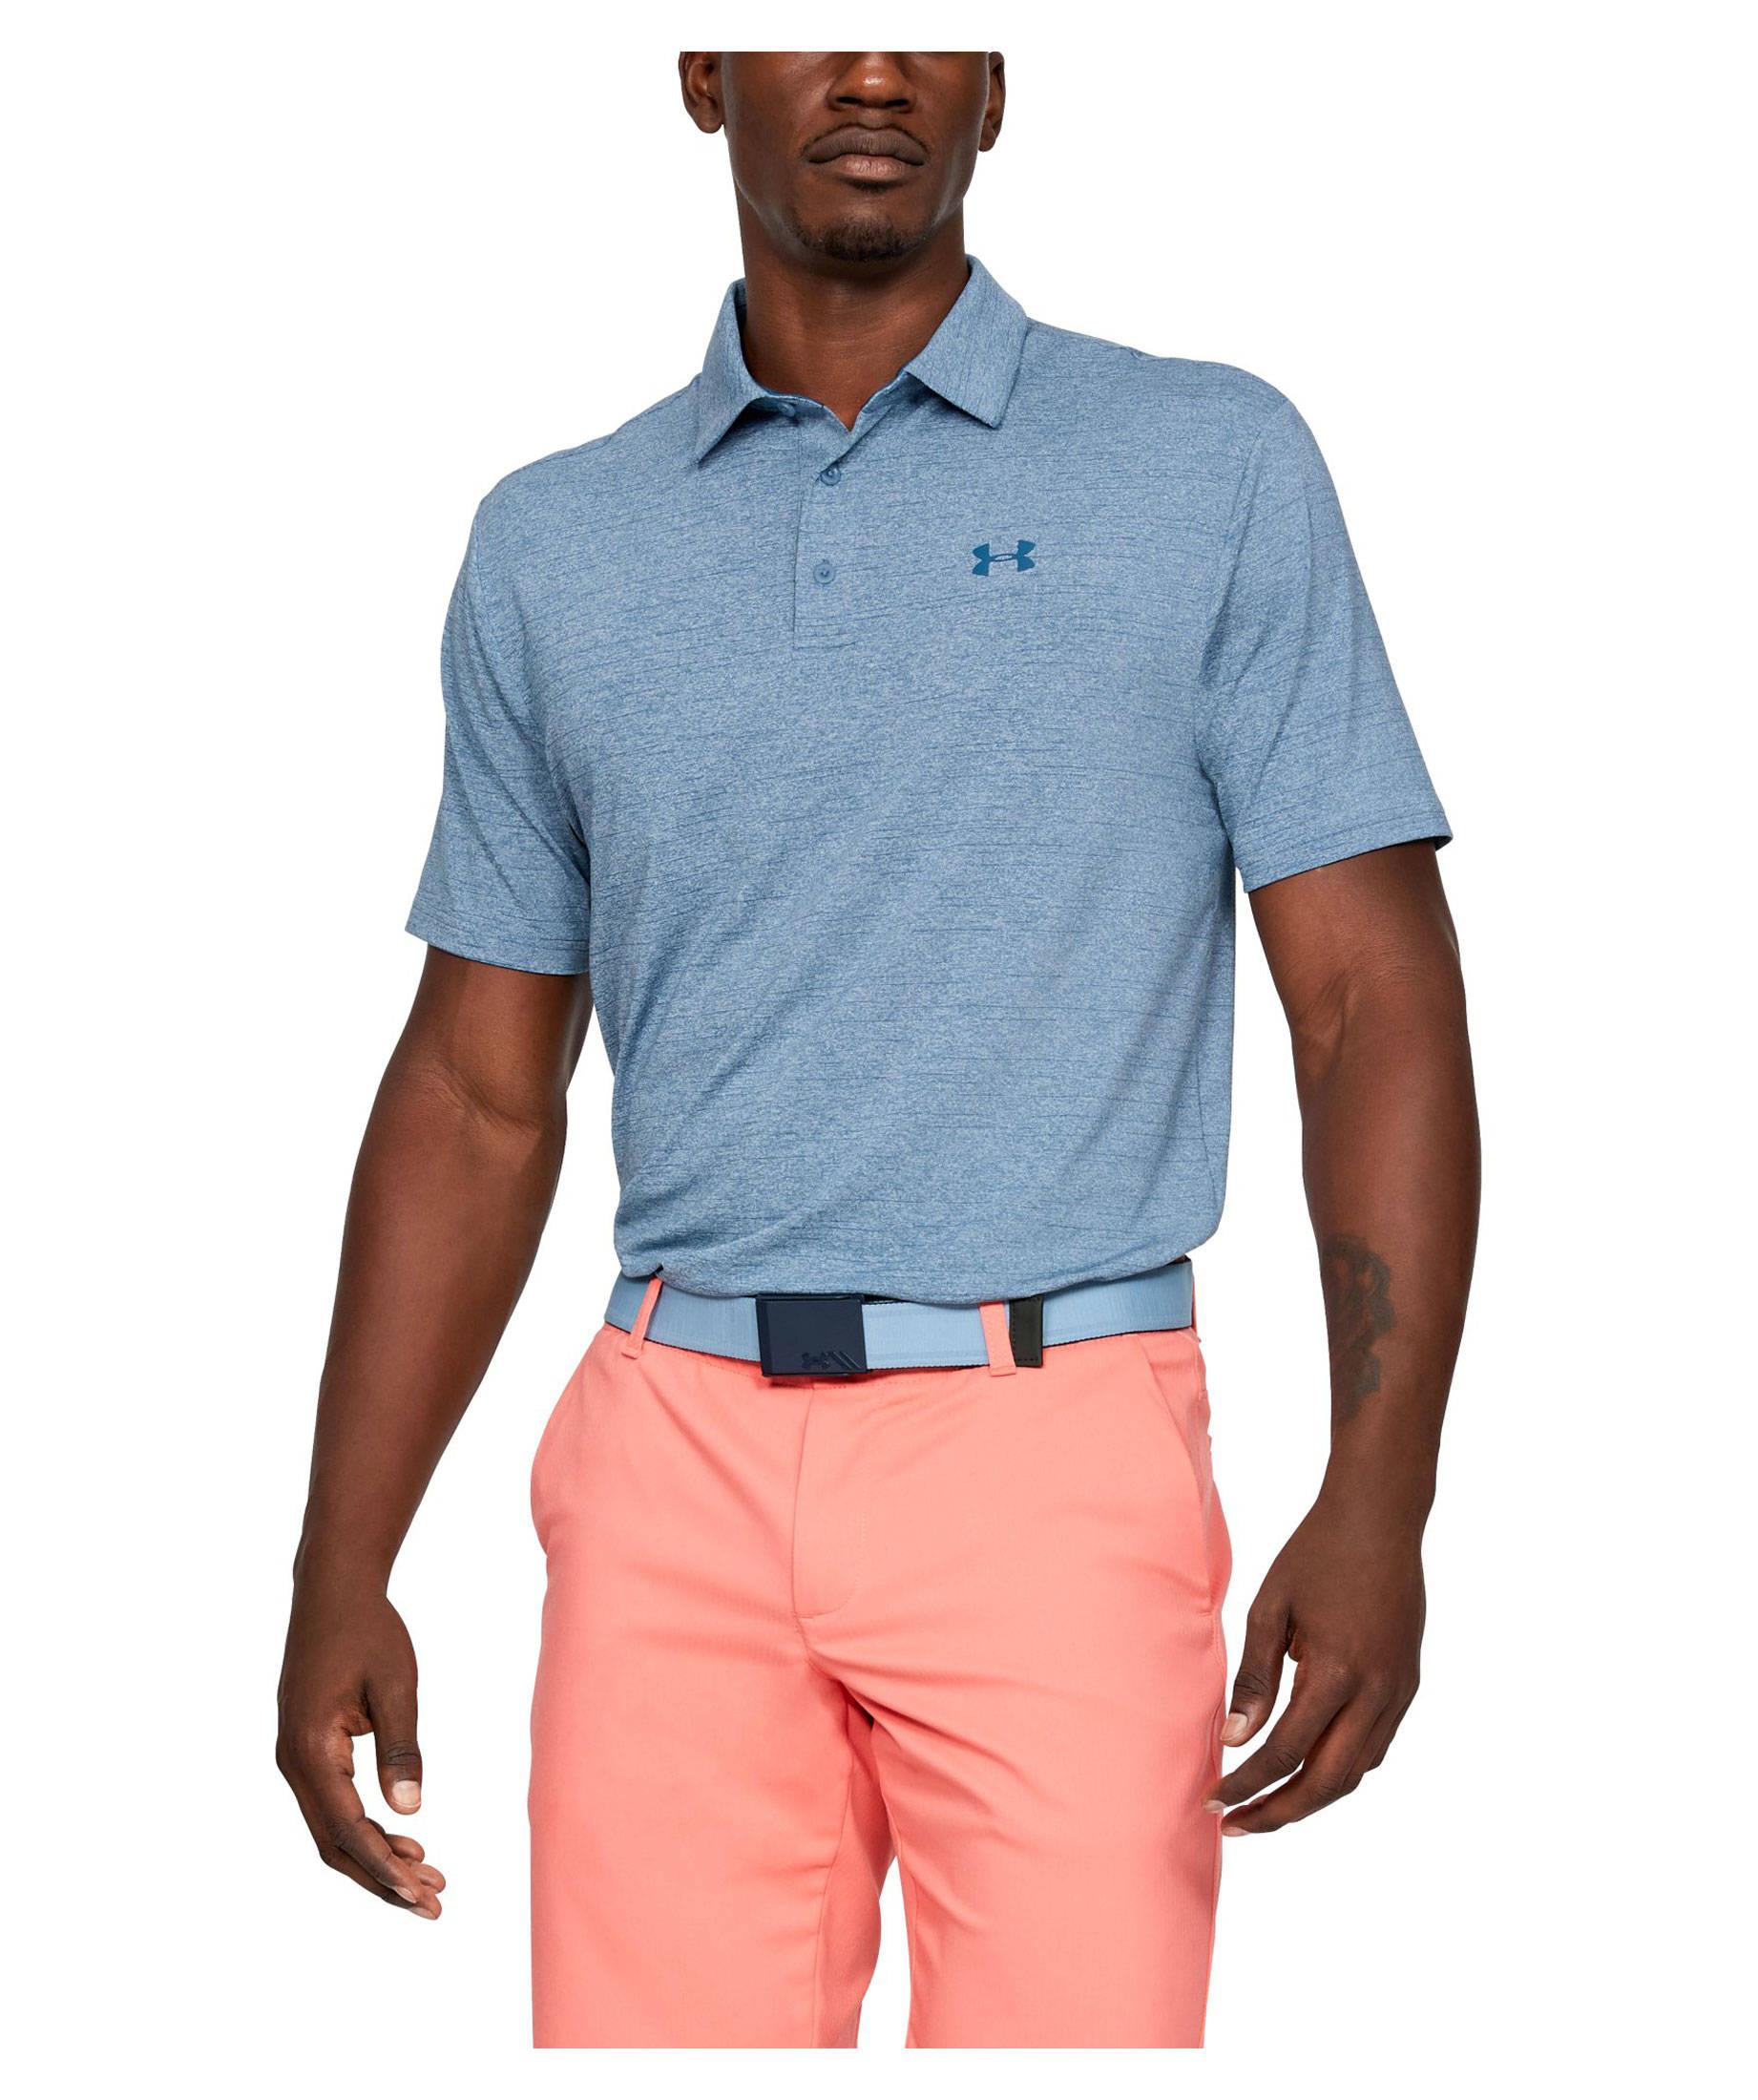 size 40 73c57 34cbf Herren Golf-Poloshirt